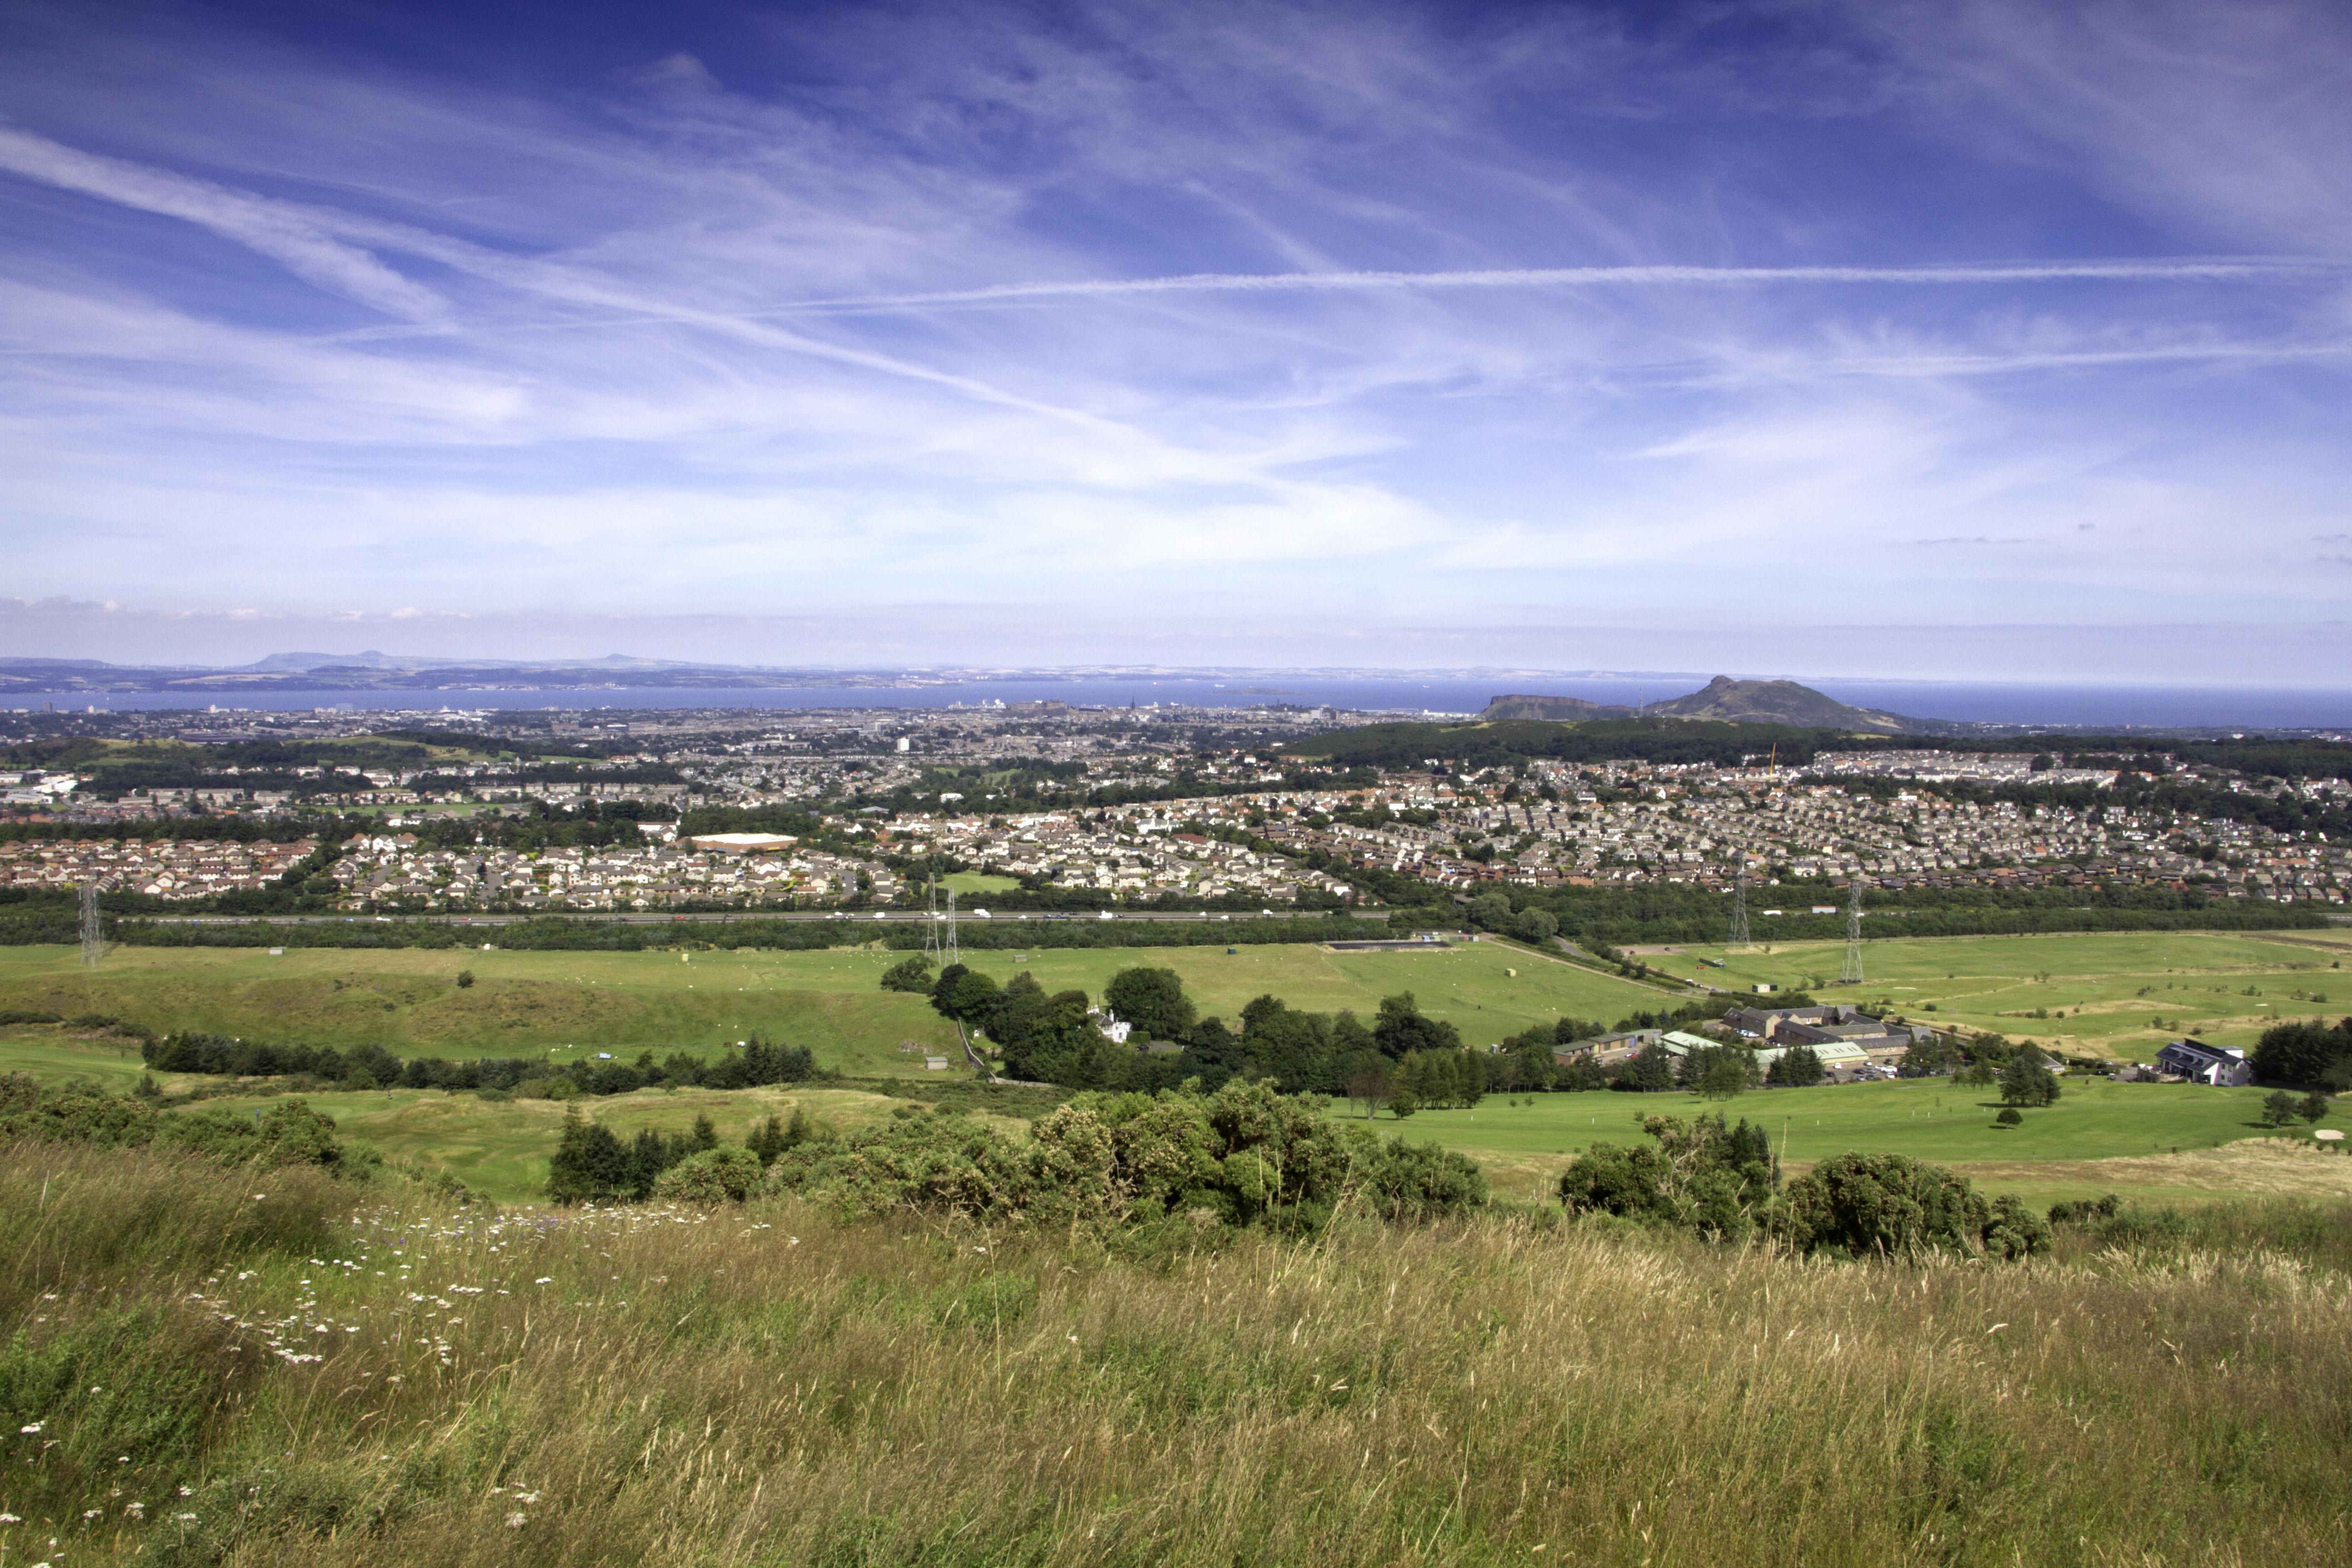 Edinburgh over the Fields